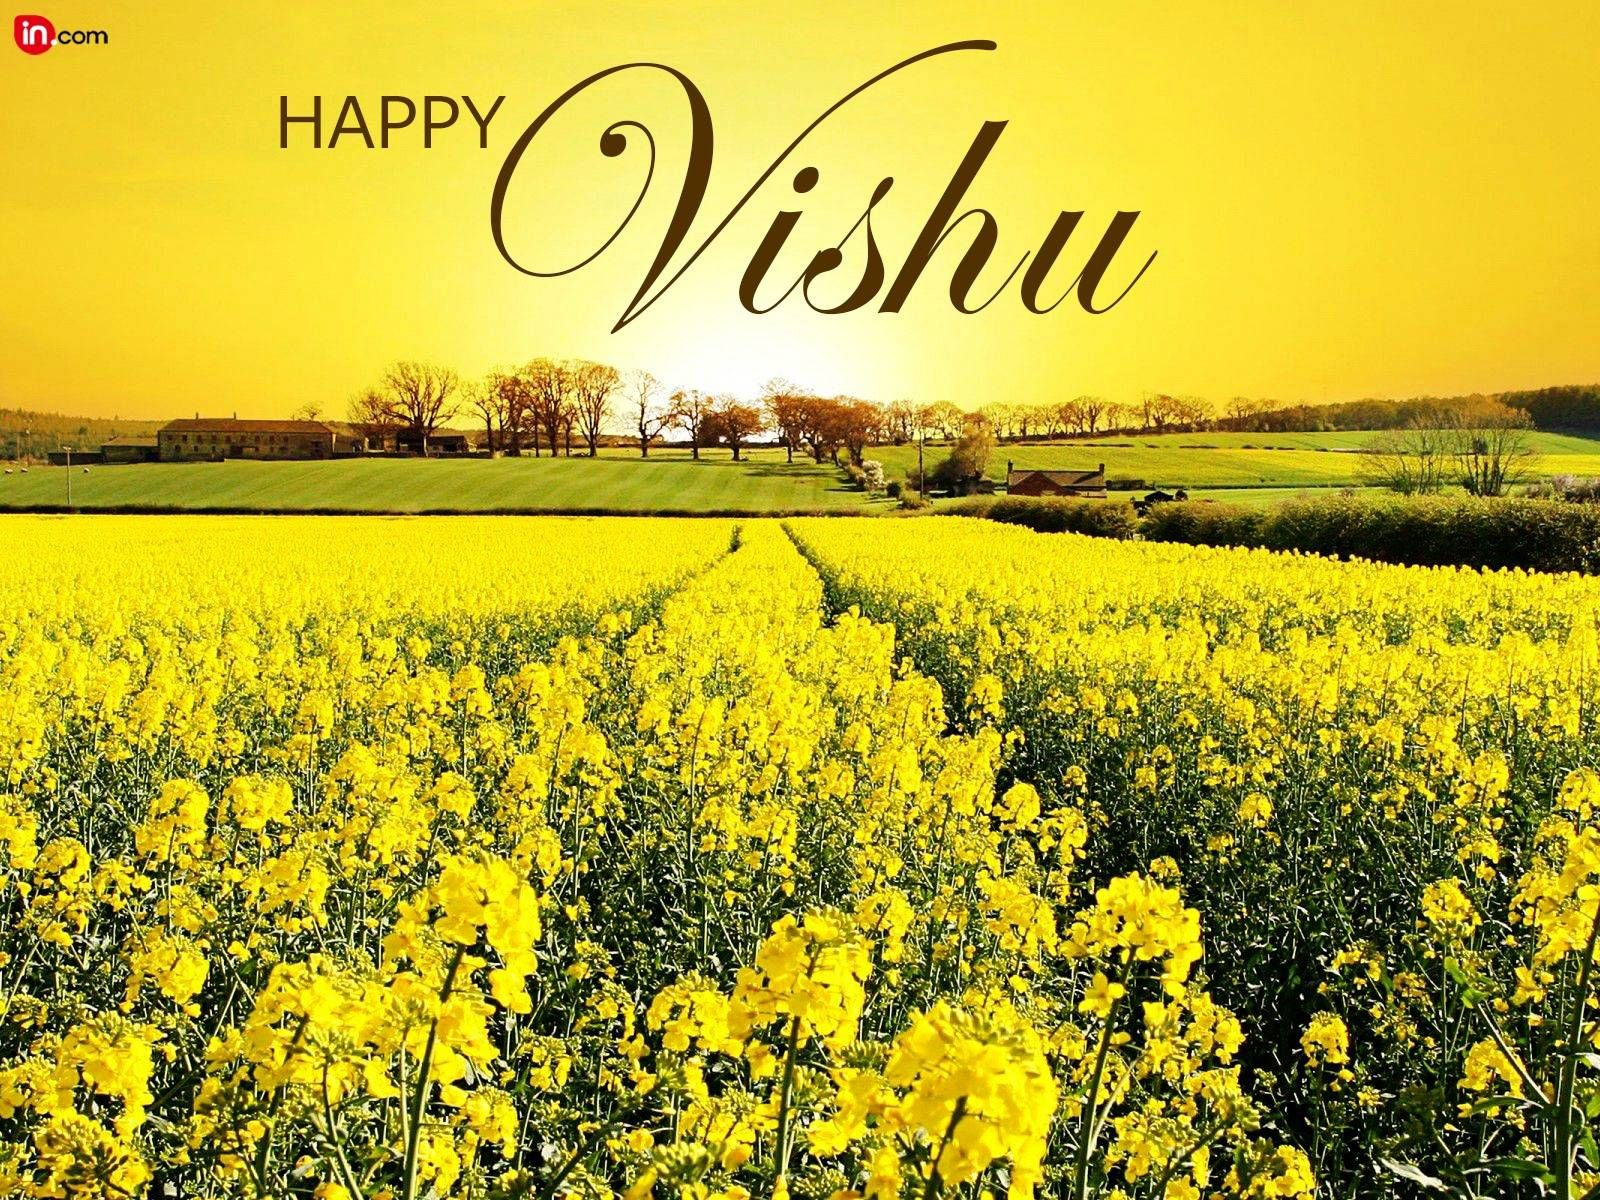 Happy Vishu Images Download Vishu Hd Photos 2016 Happy Vishu